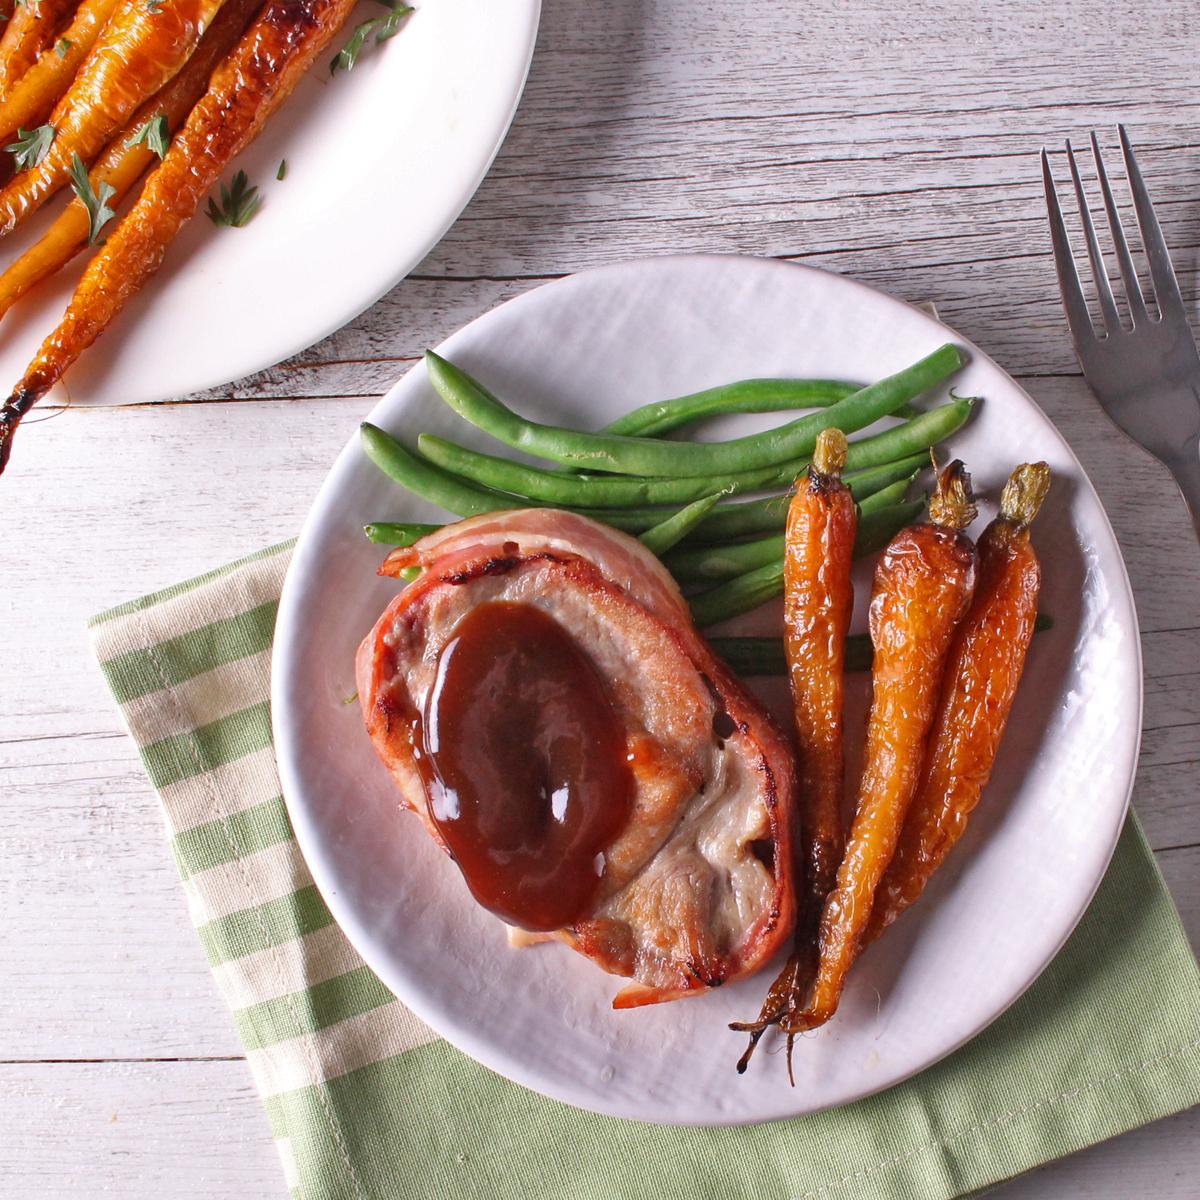 BBQ Pork Fillet Mignon with Roasted Dutch Carrots - Loin steak